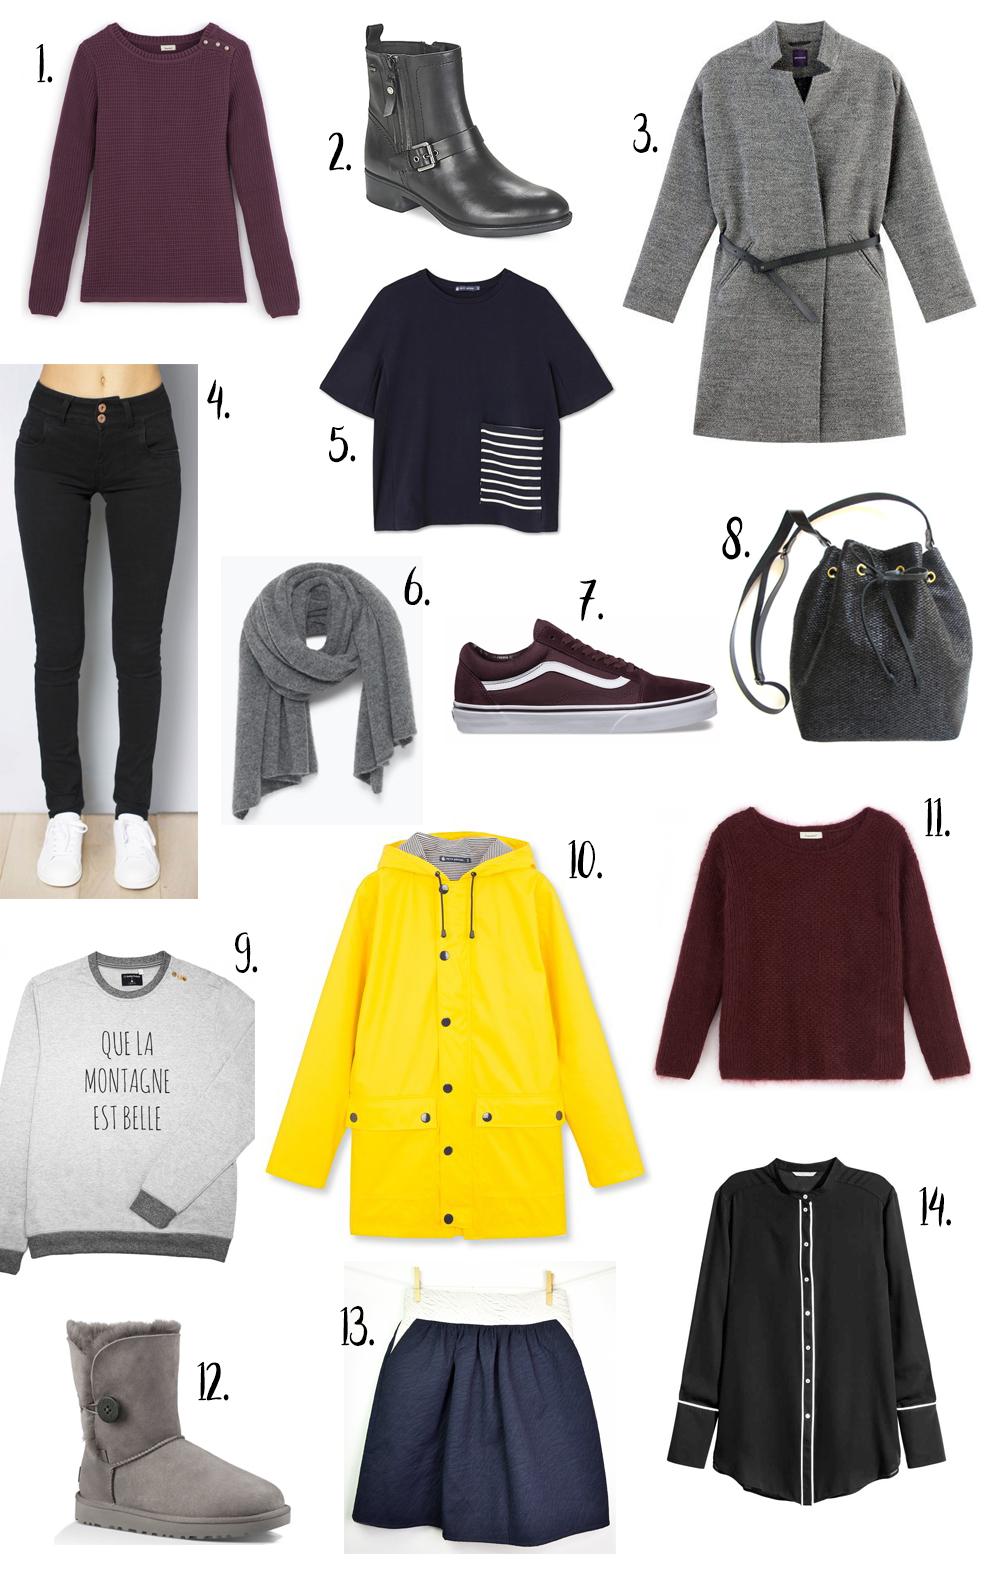 melopolitan-selection-shopping-dressing-ideal-eco-responsable